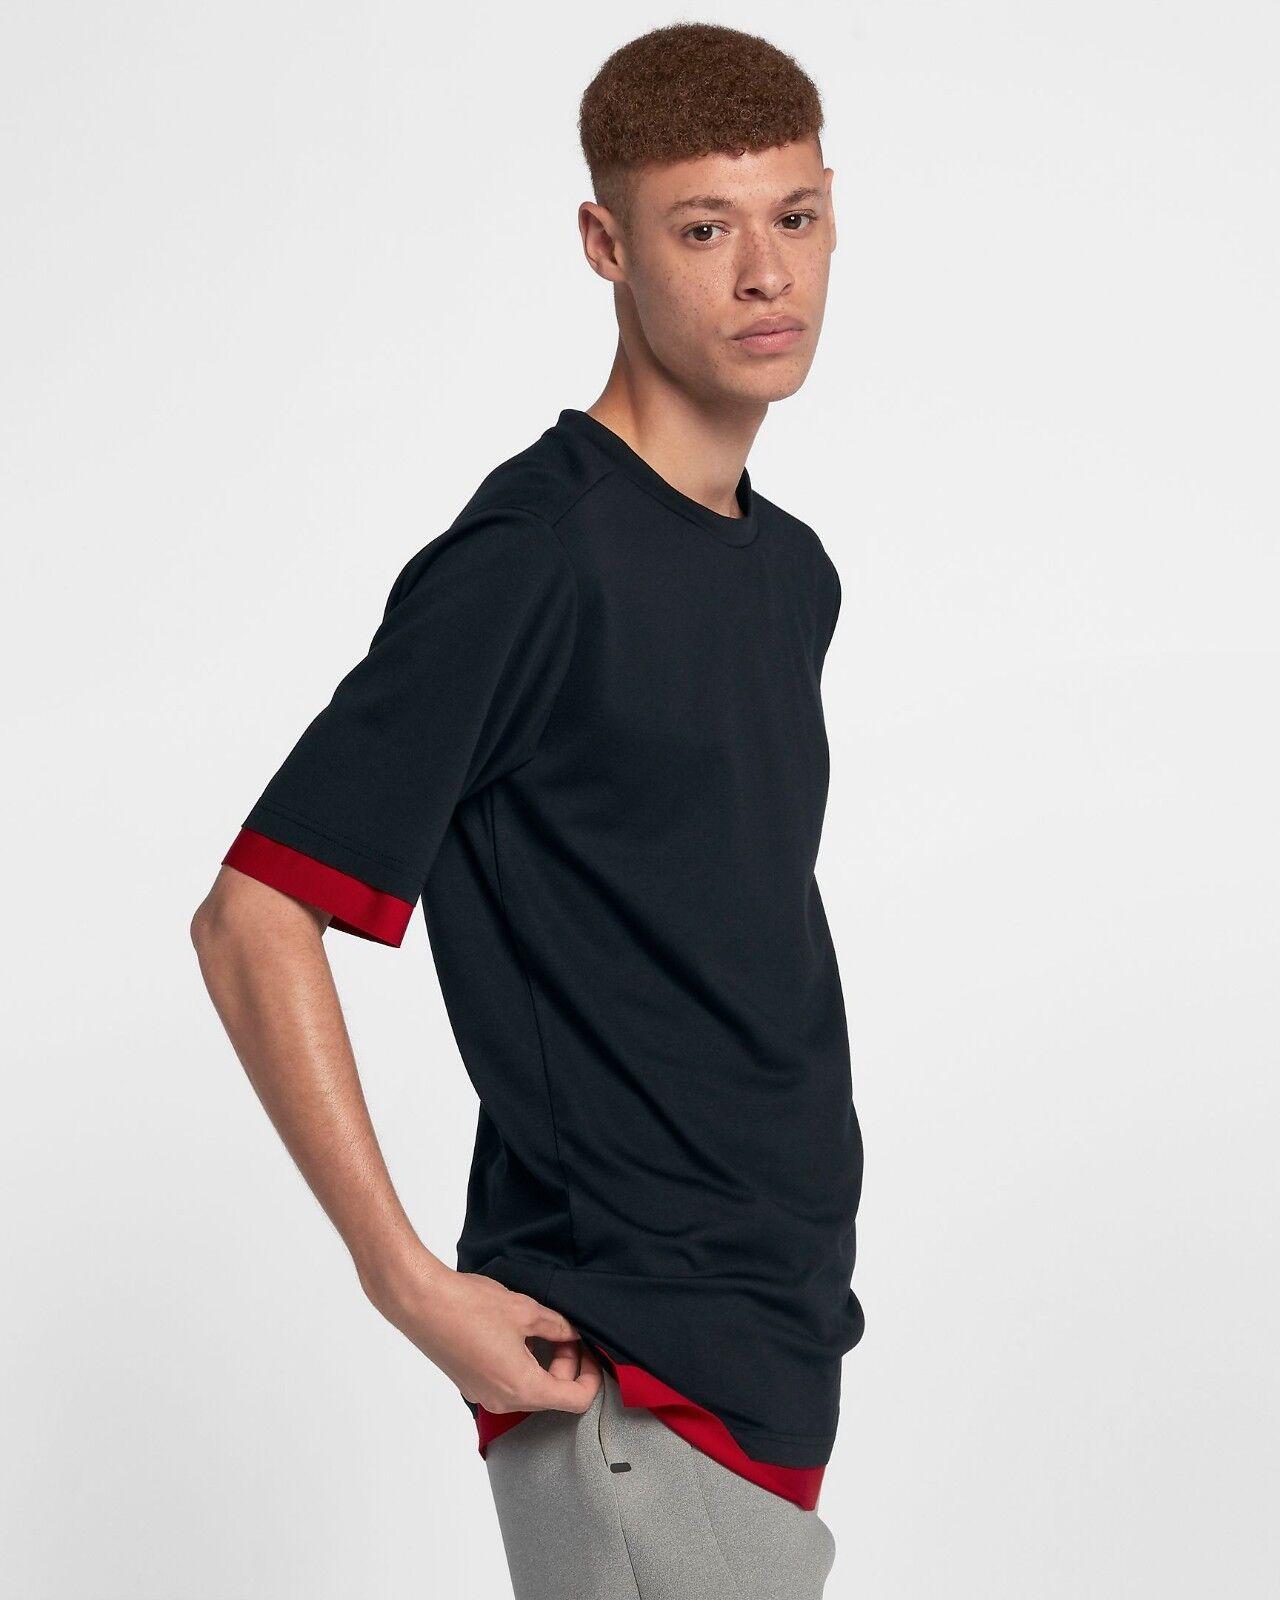 Jordan Lifestyle Tech T-Shirt Herren Schwarz Rotes T-Shirt 899788-010